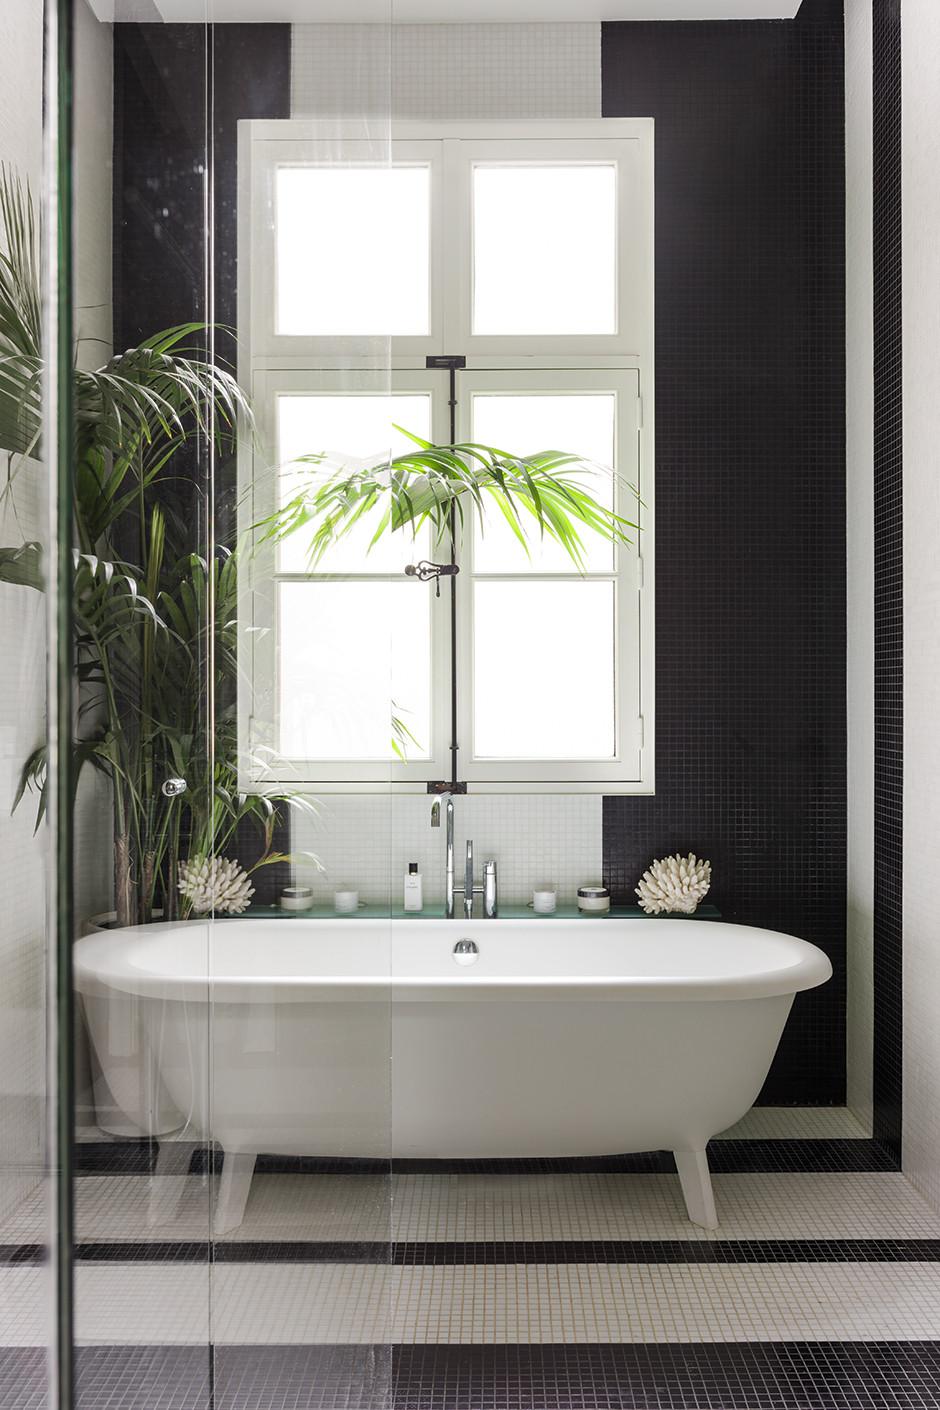 Décor Inspiration: A Paris Apartment Designed by Alireza Razavi